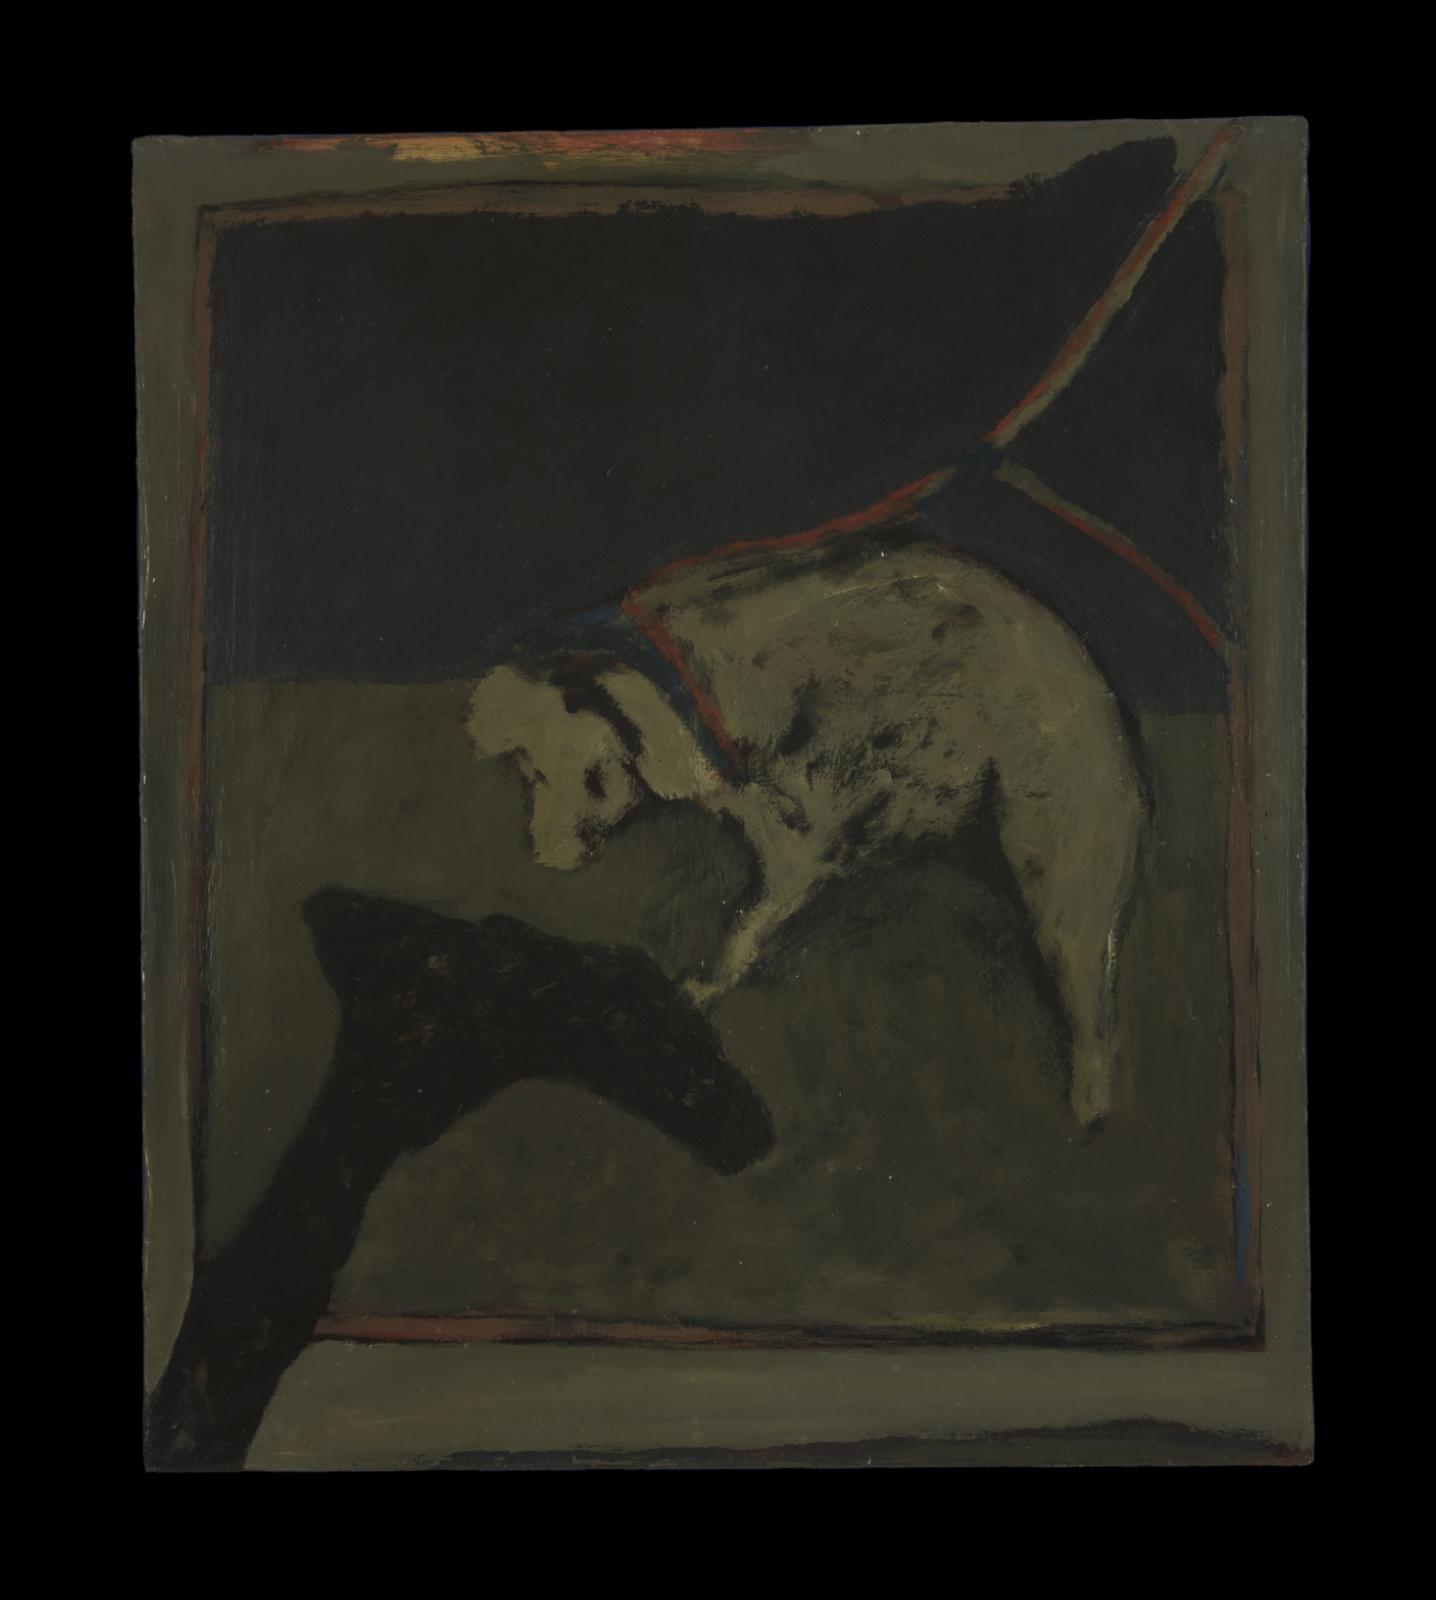 Incontro, 1980